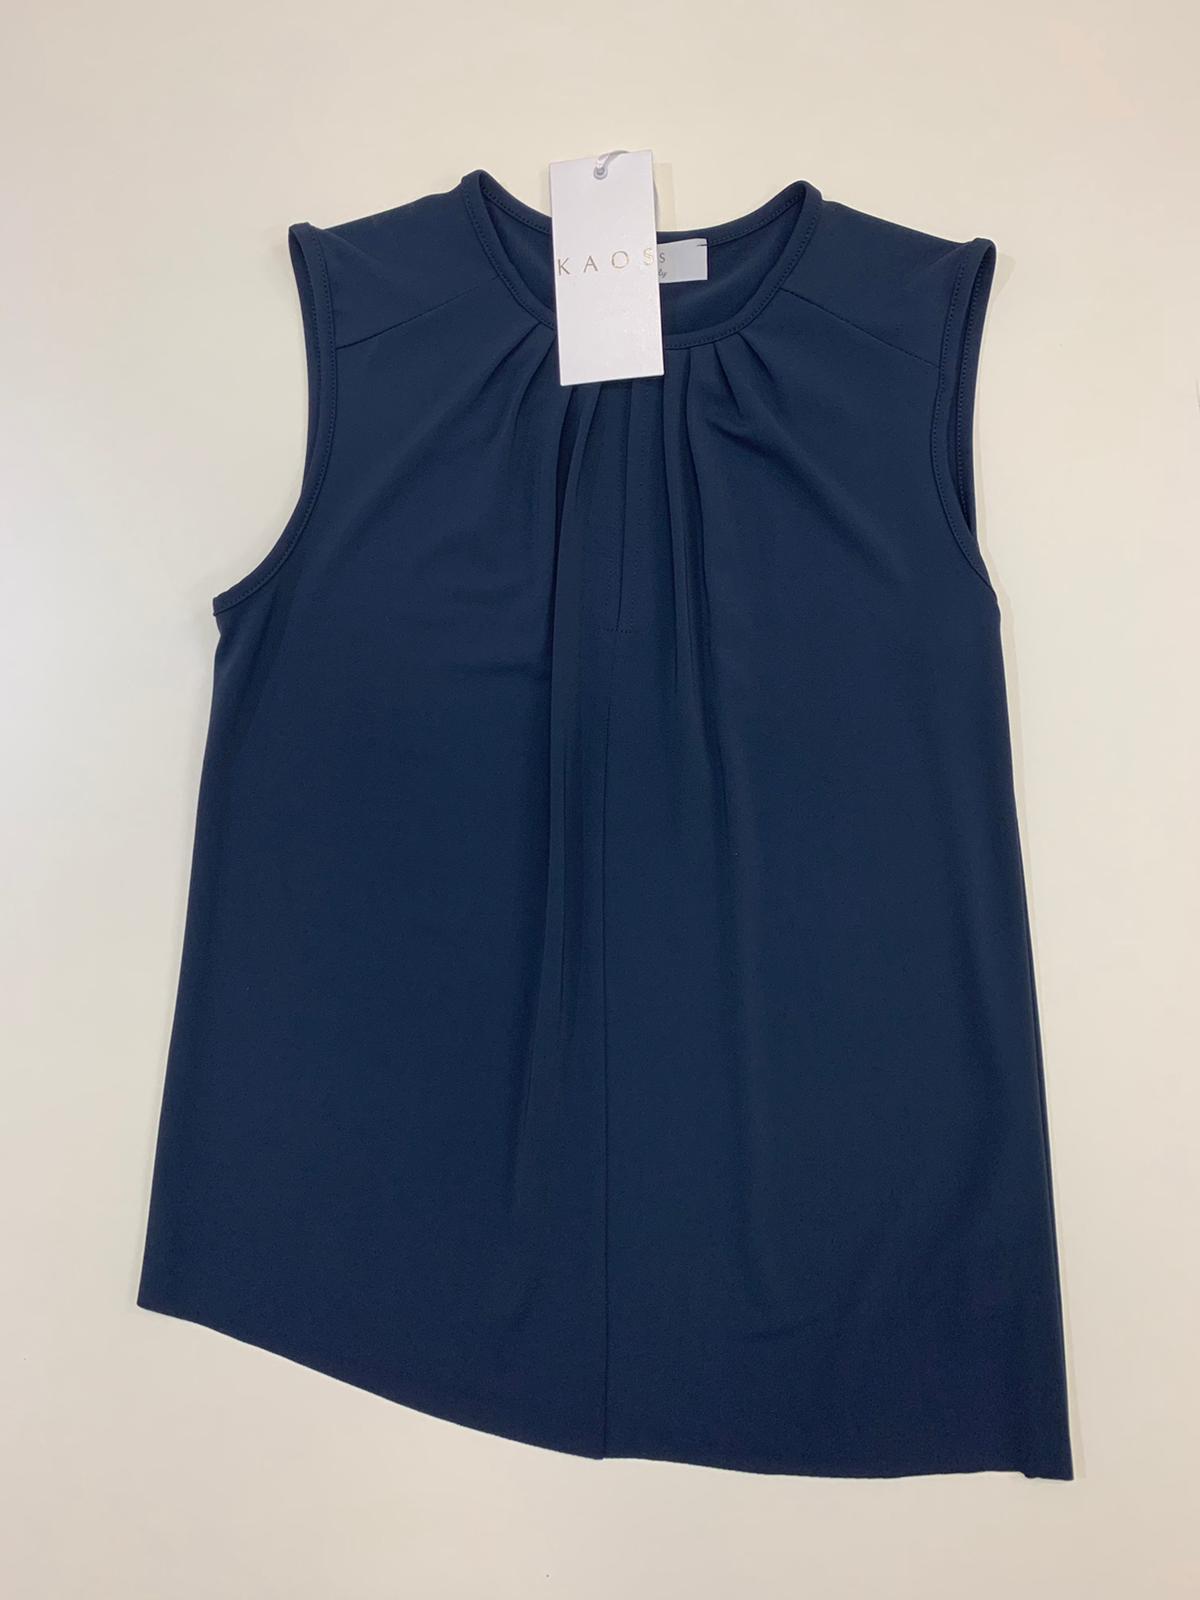 Blusa Donna Kaos Collection Jersey Blu